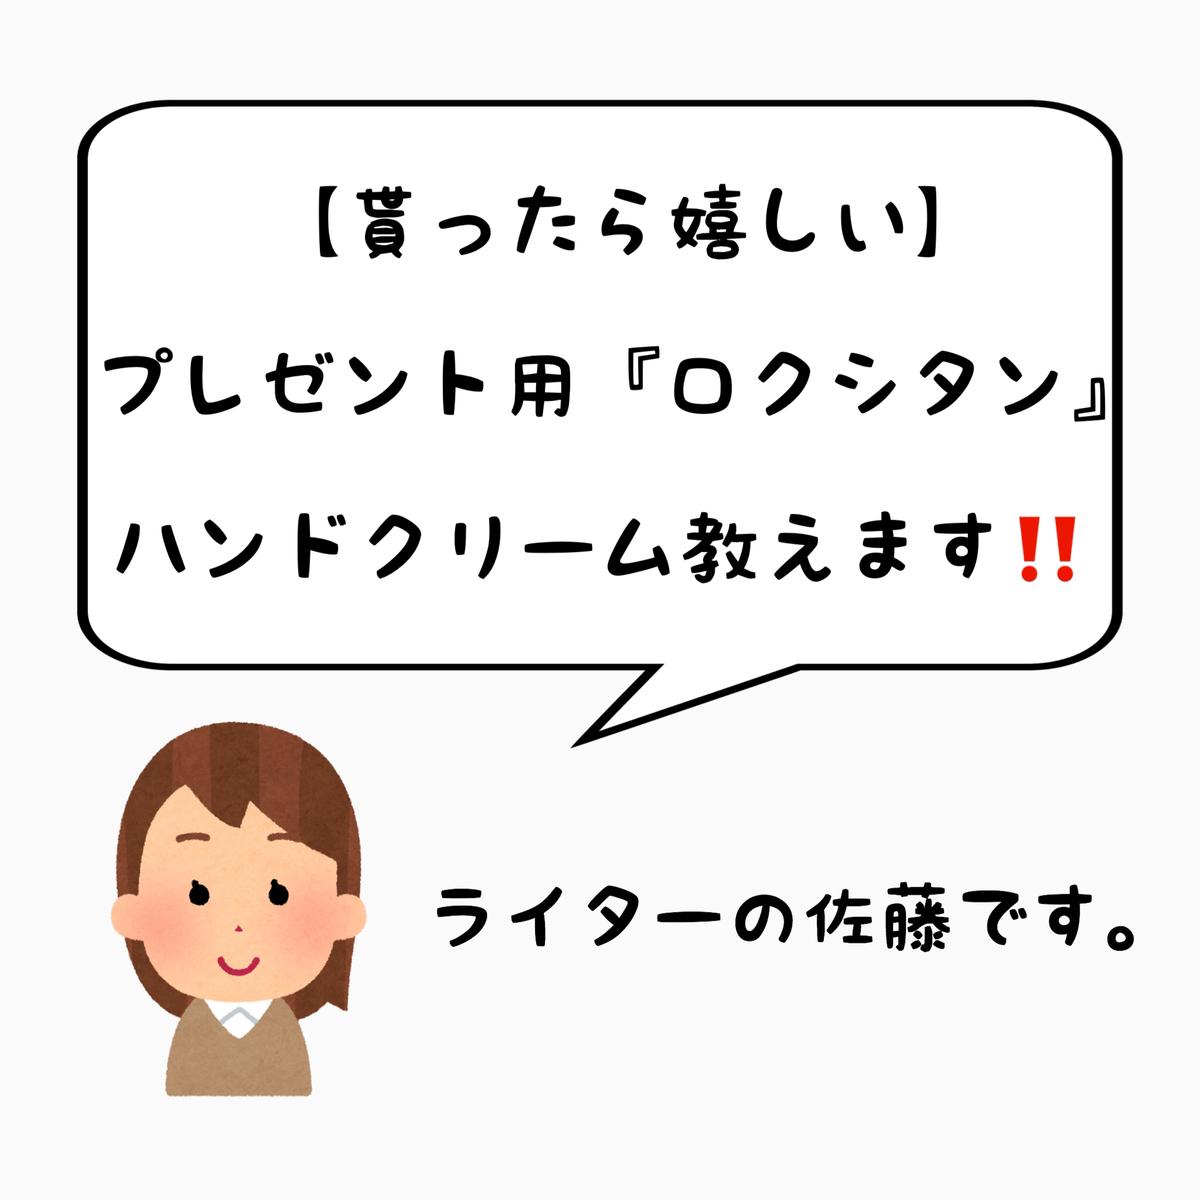 f:id:nokonoko_o:20201029181840j:plain